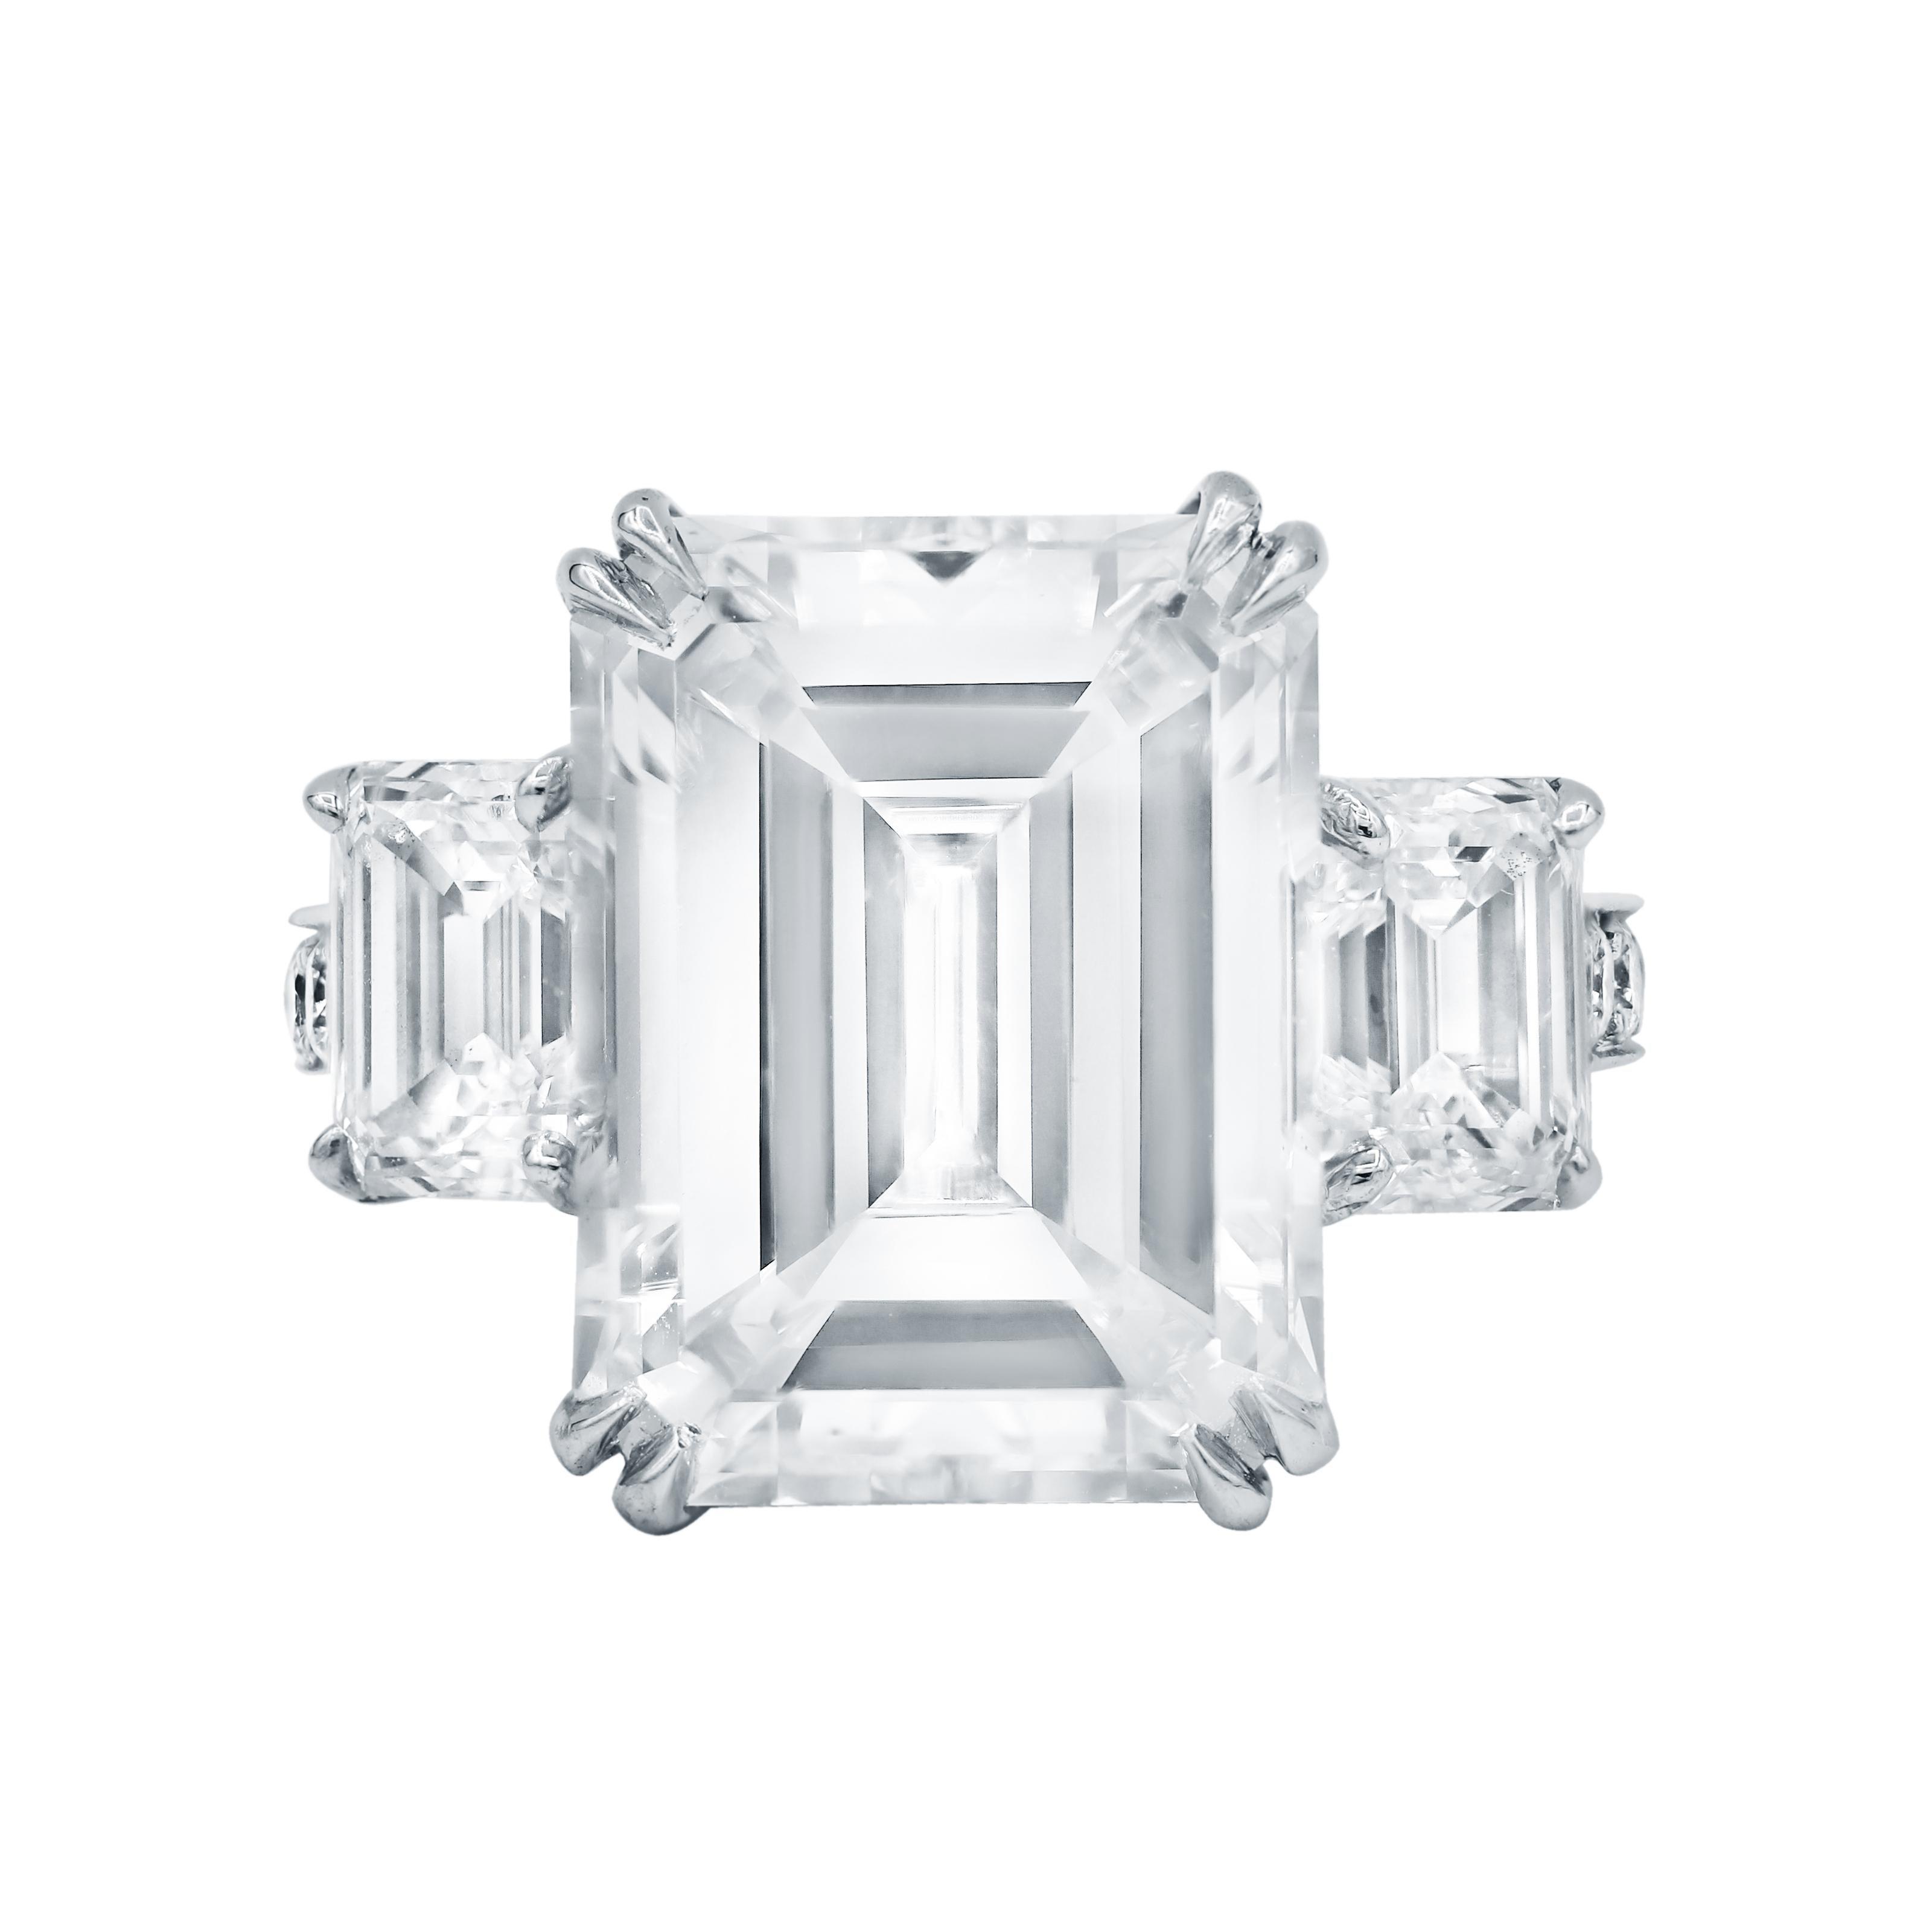 GIA Certified 10.02 Carat Emerald Cut Diamond Ring